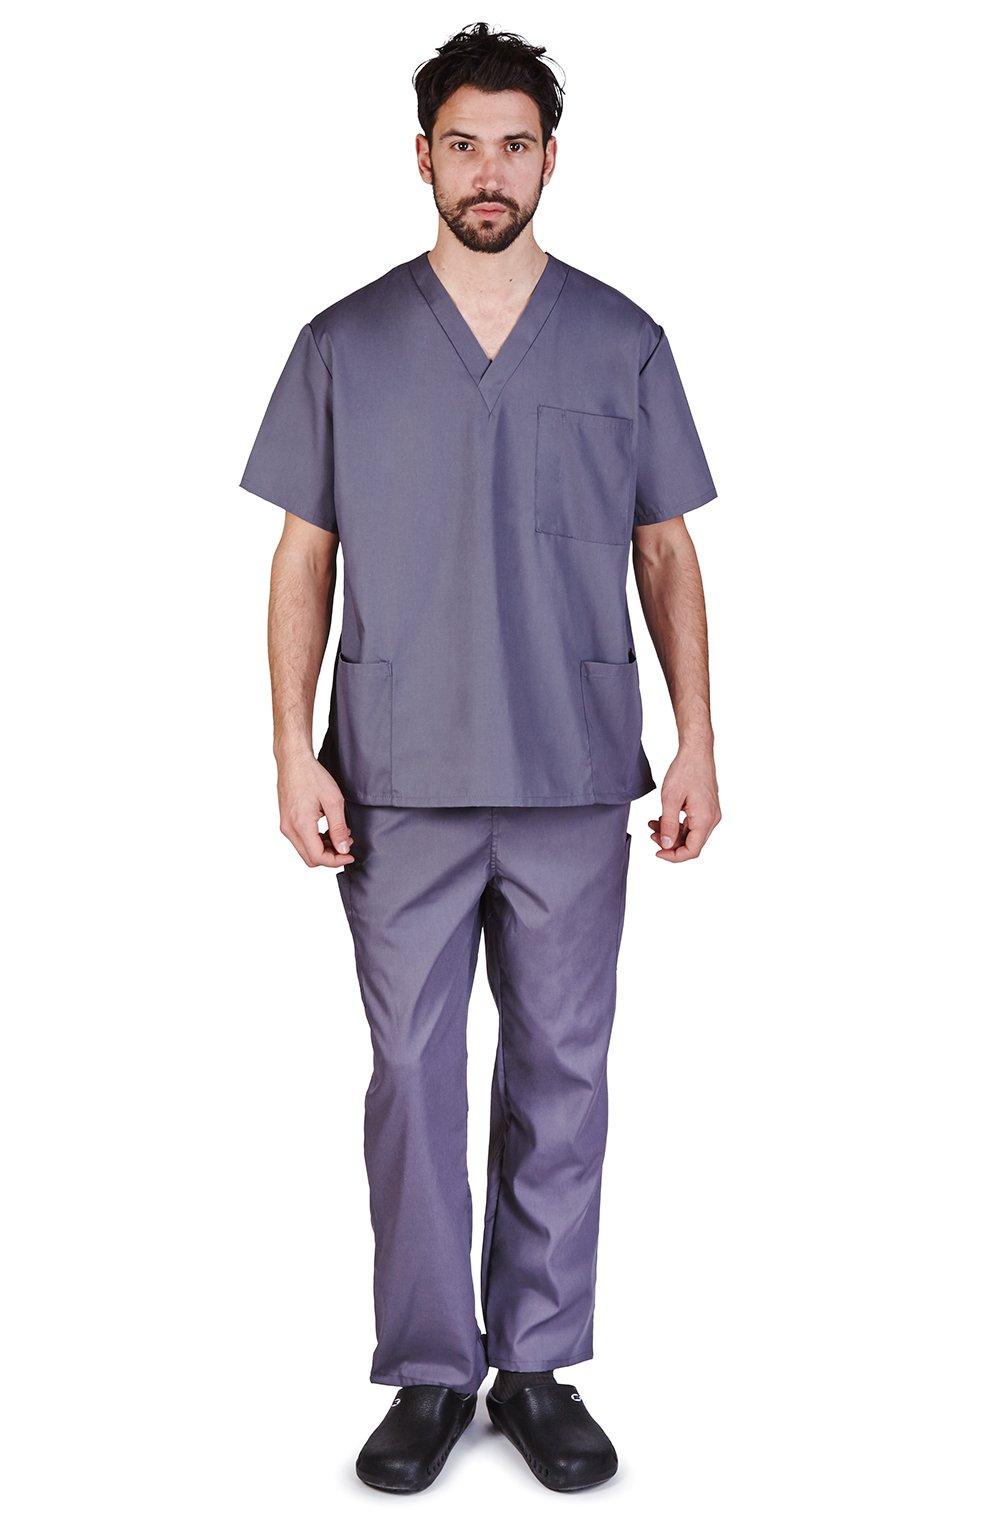 M&M SCRUBS Men Scrub Set Medical Scrub Top and Pants M Charcoal